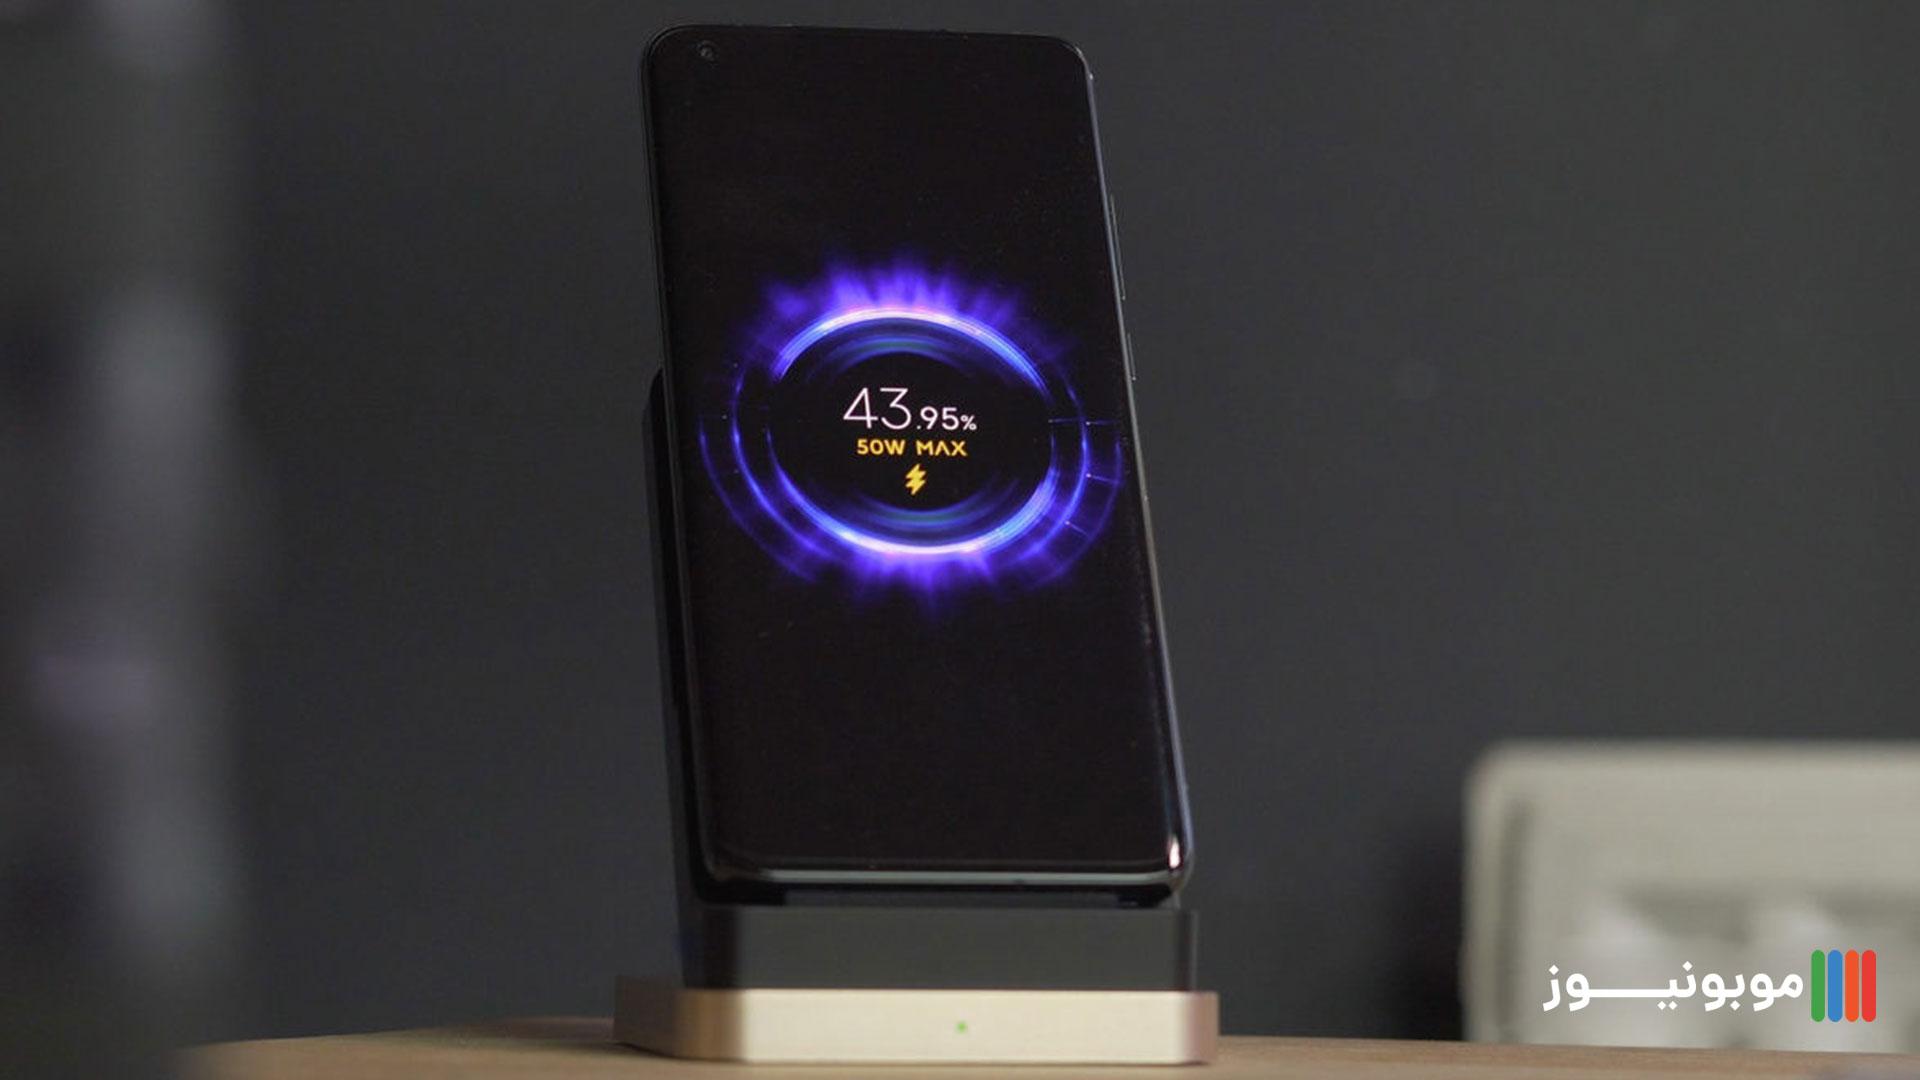 شارژ گوشی رو بین 20 تا 80 درصد مدیریت کن